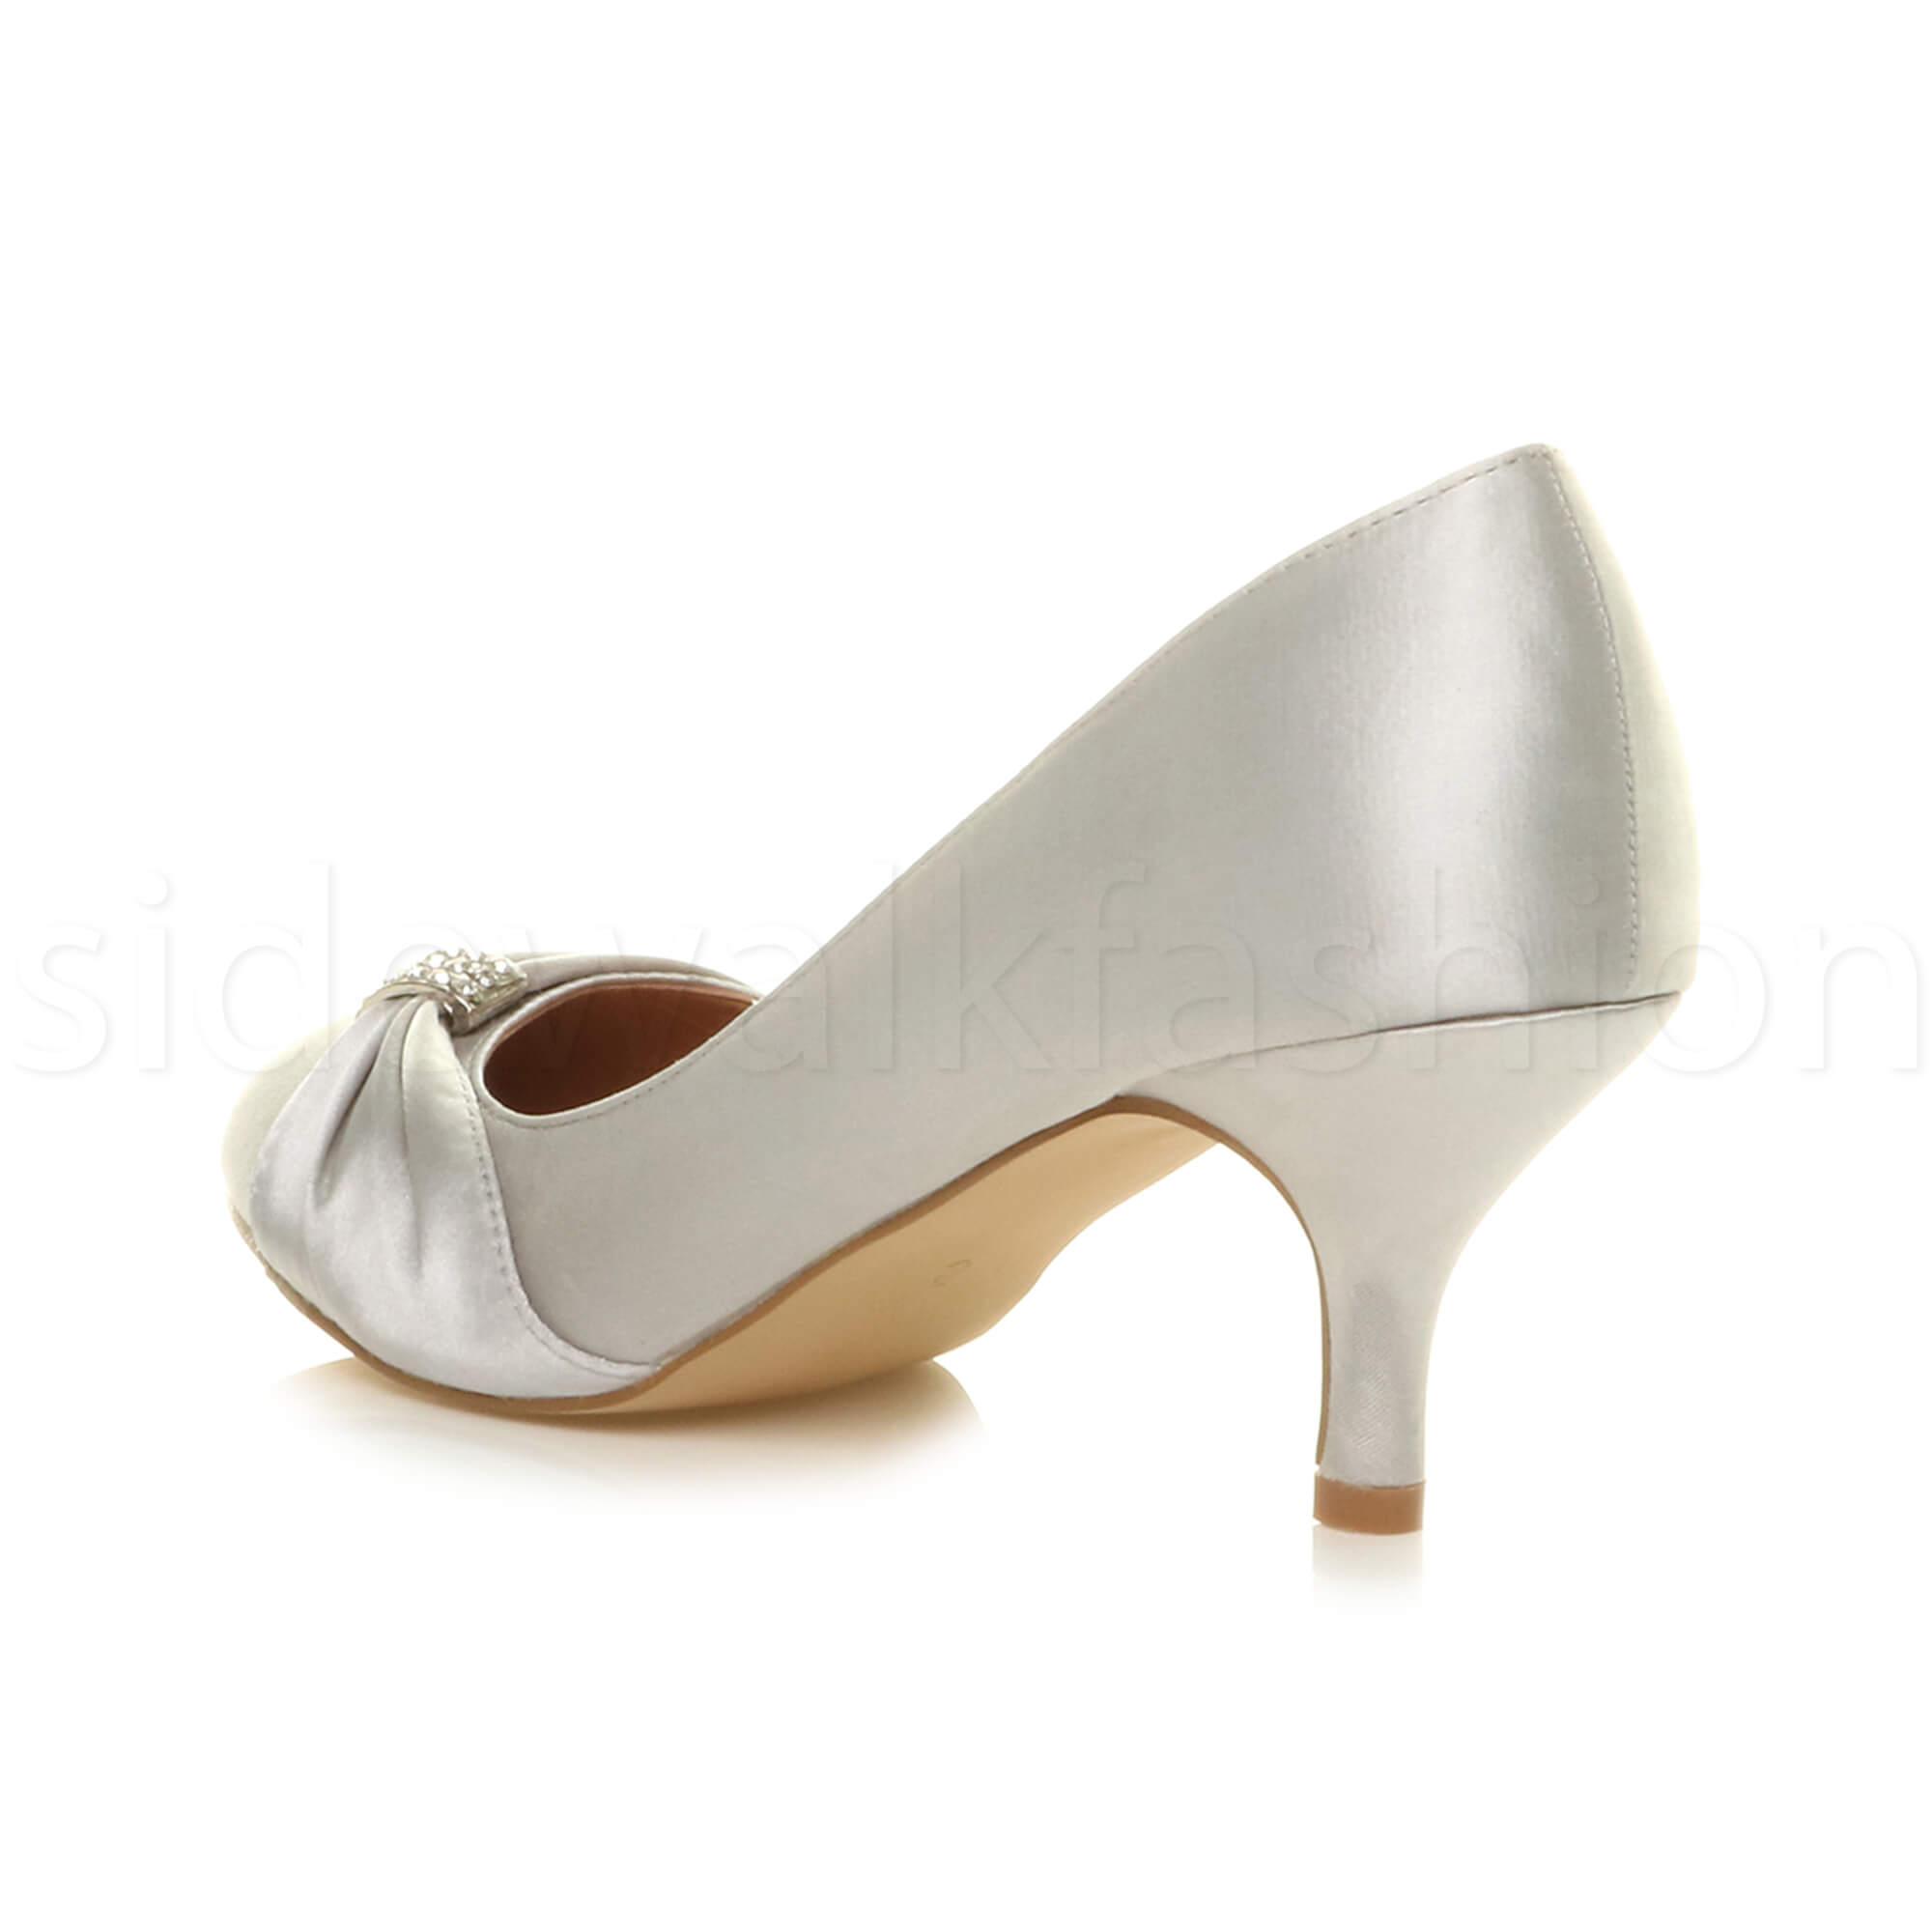 Womens-ladies-low-mid-heel-diamante-party-smart-evening-court-shoes-size thumbnail 93